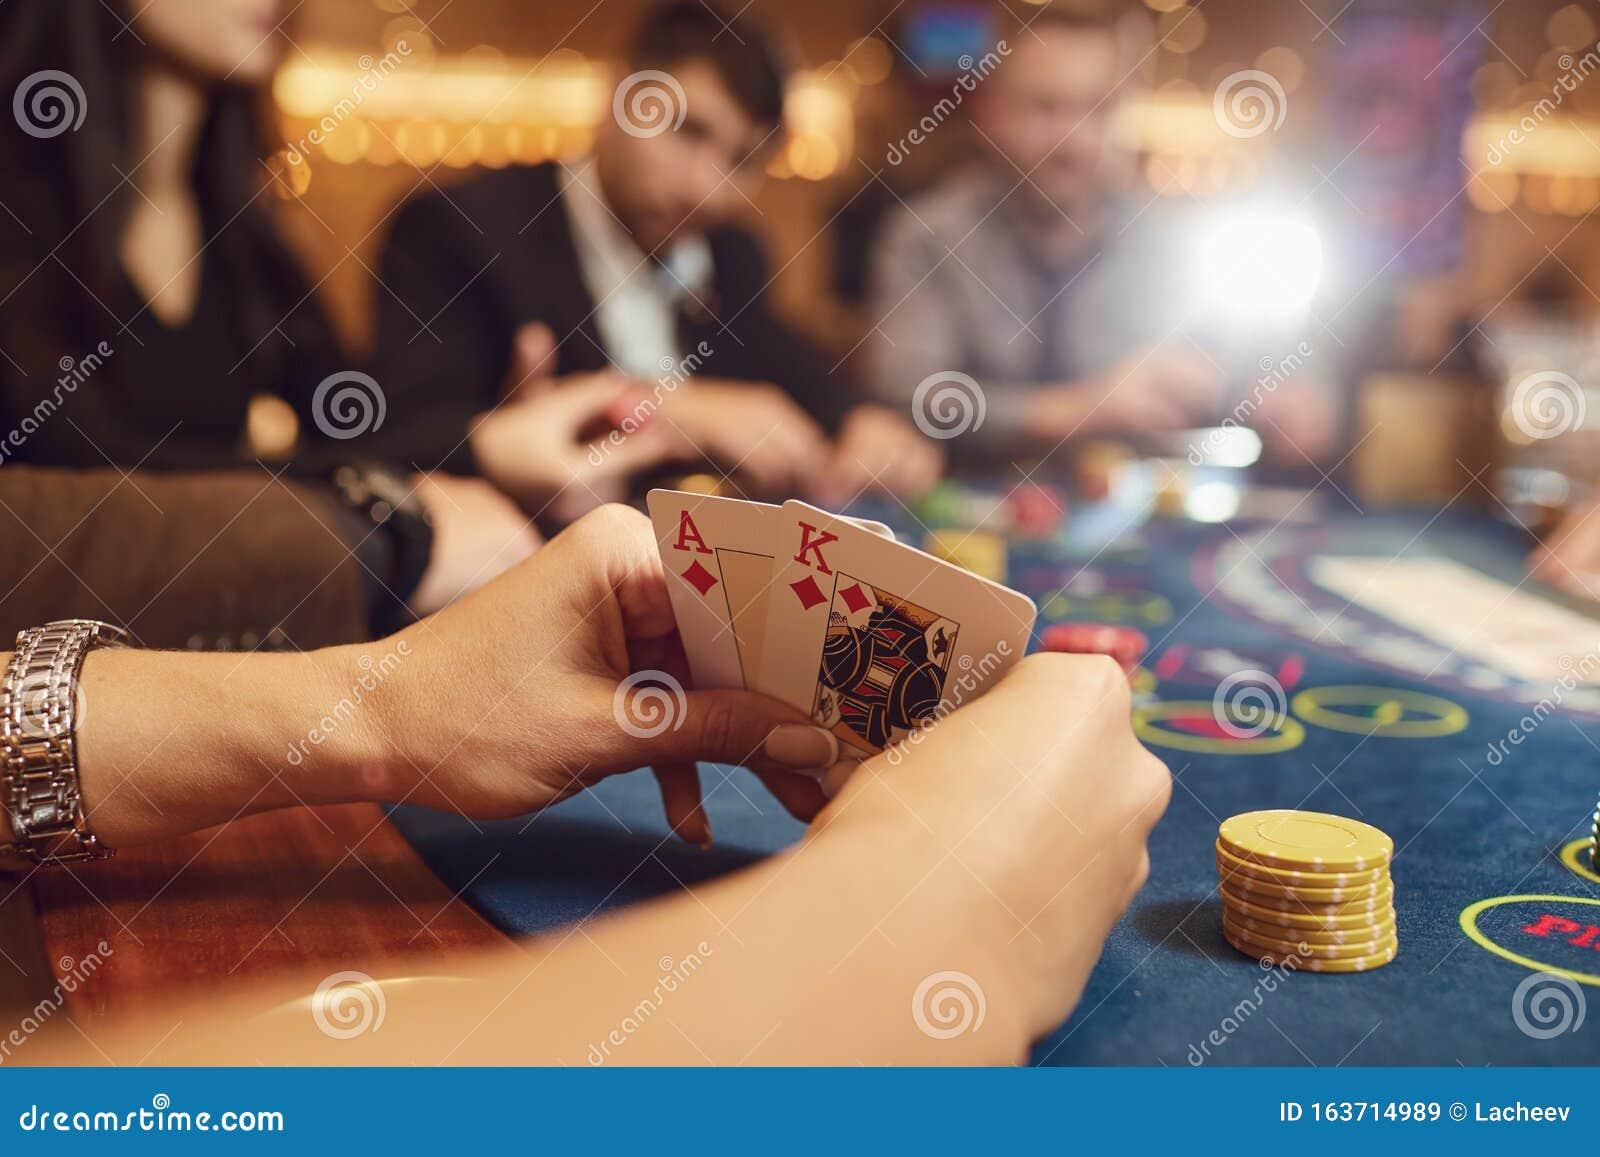 Что объединяет казино карты казино риобет бонусы